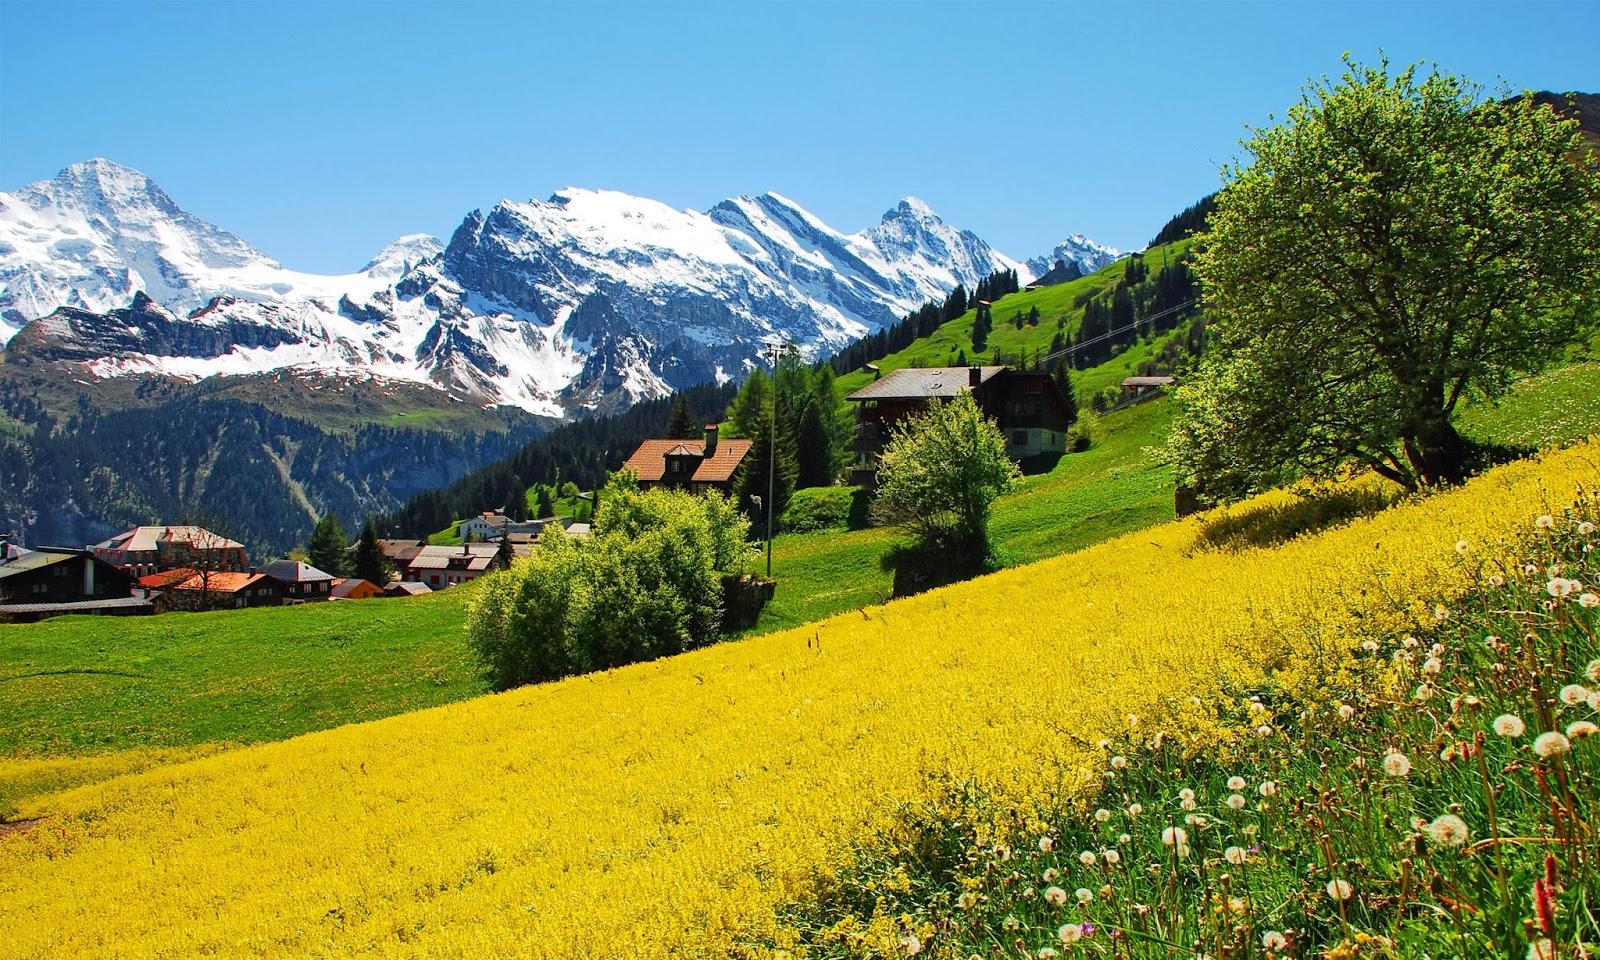 Switzerland hd wallpapers no1hdwallpapers - Switzerland wallpaper full hd ...